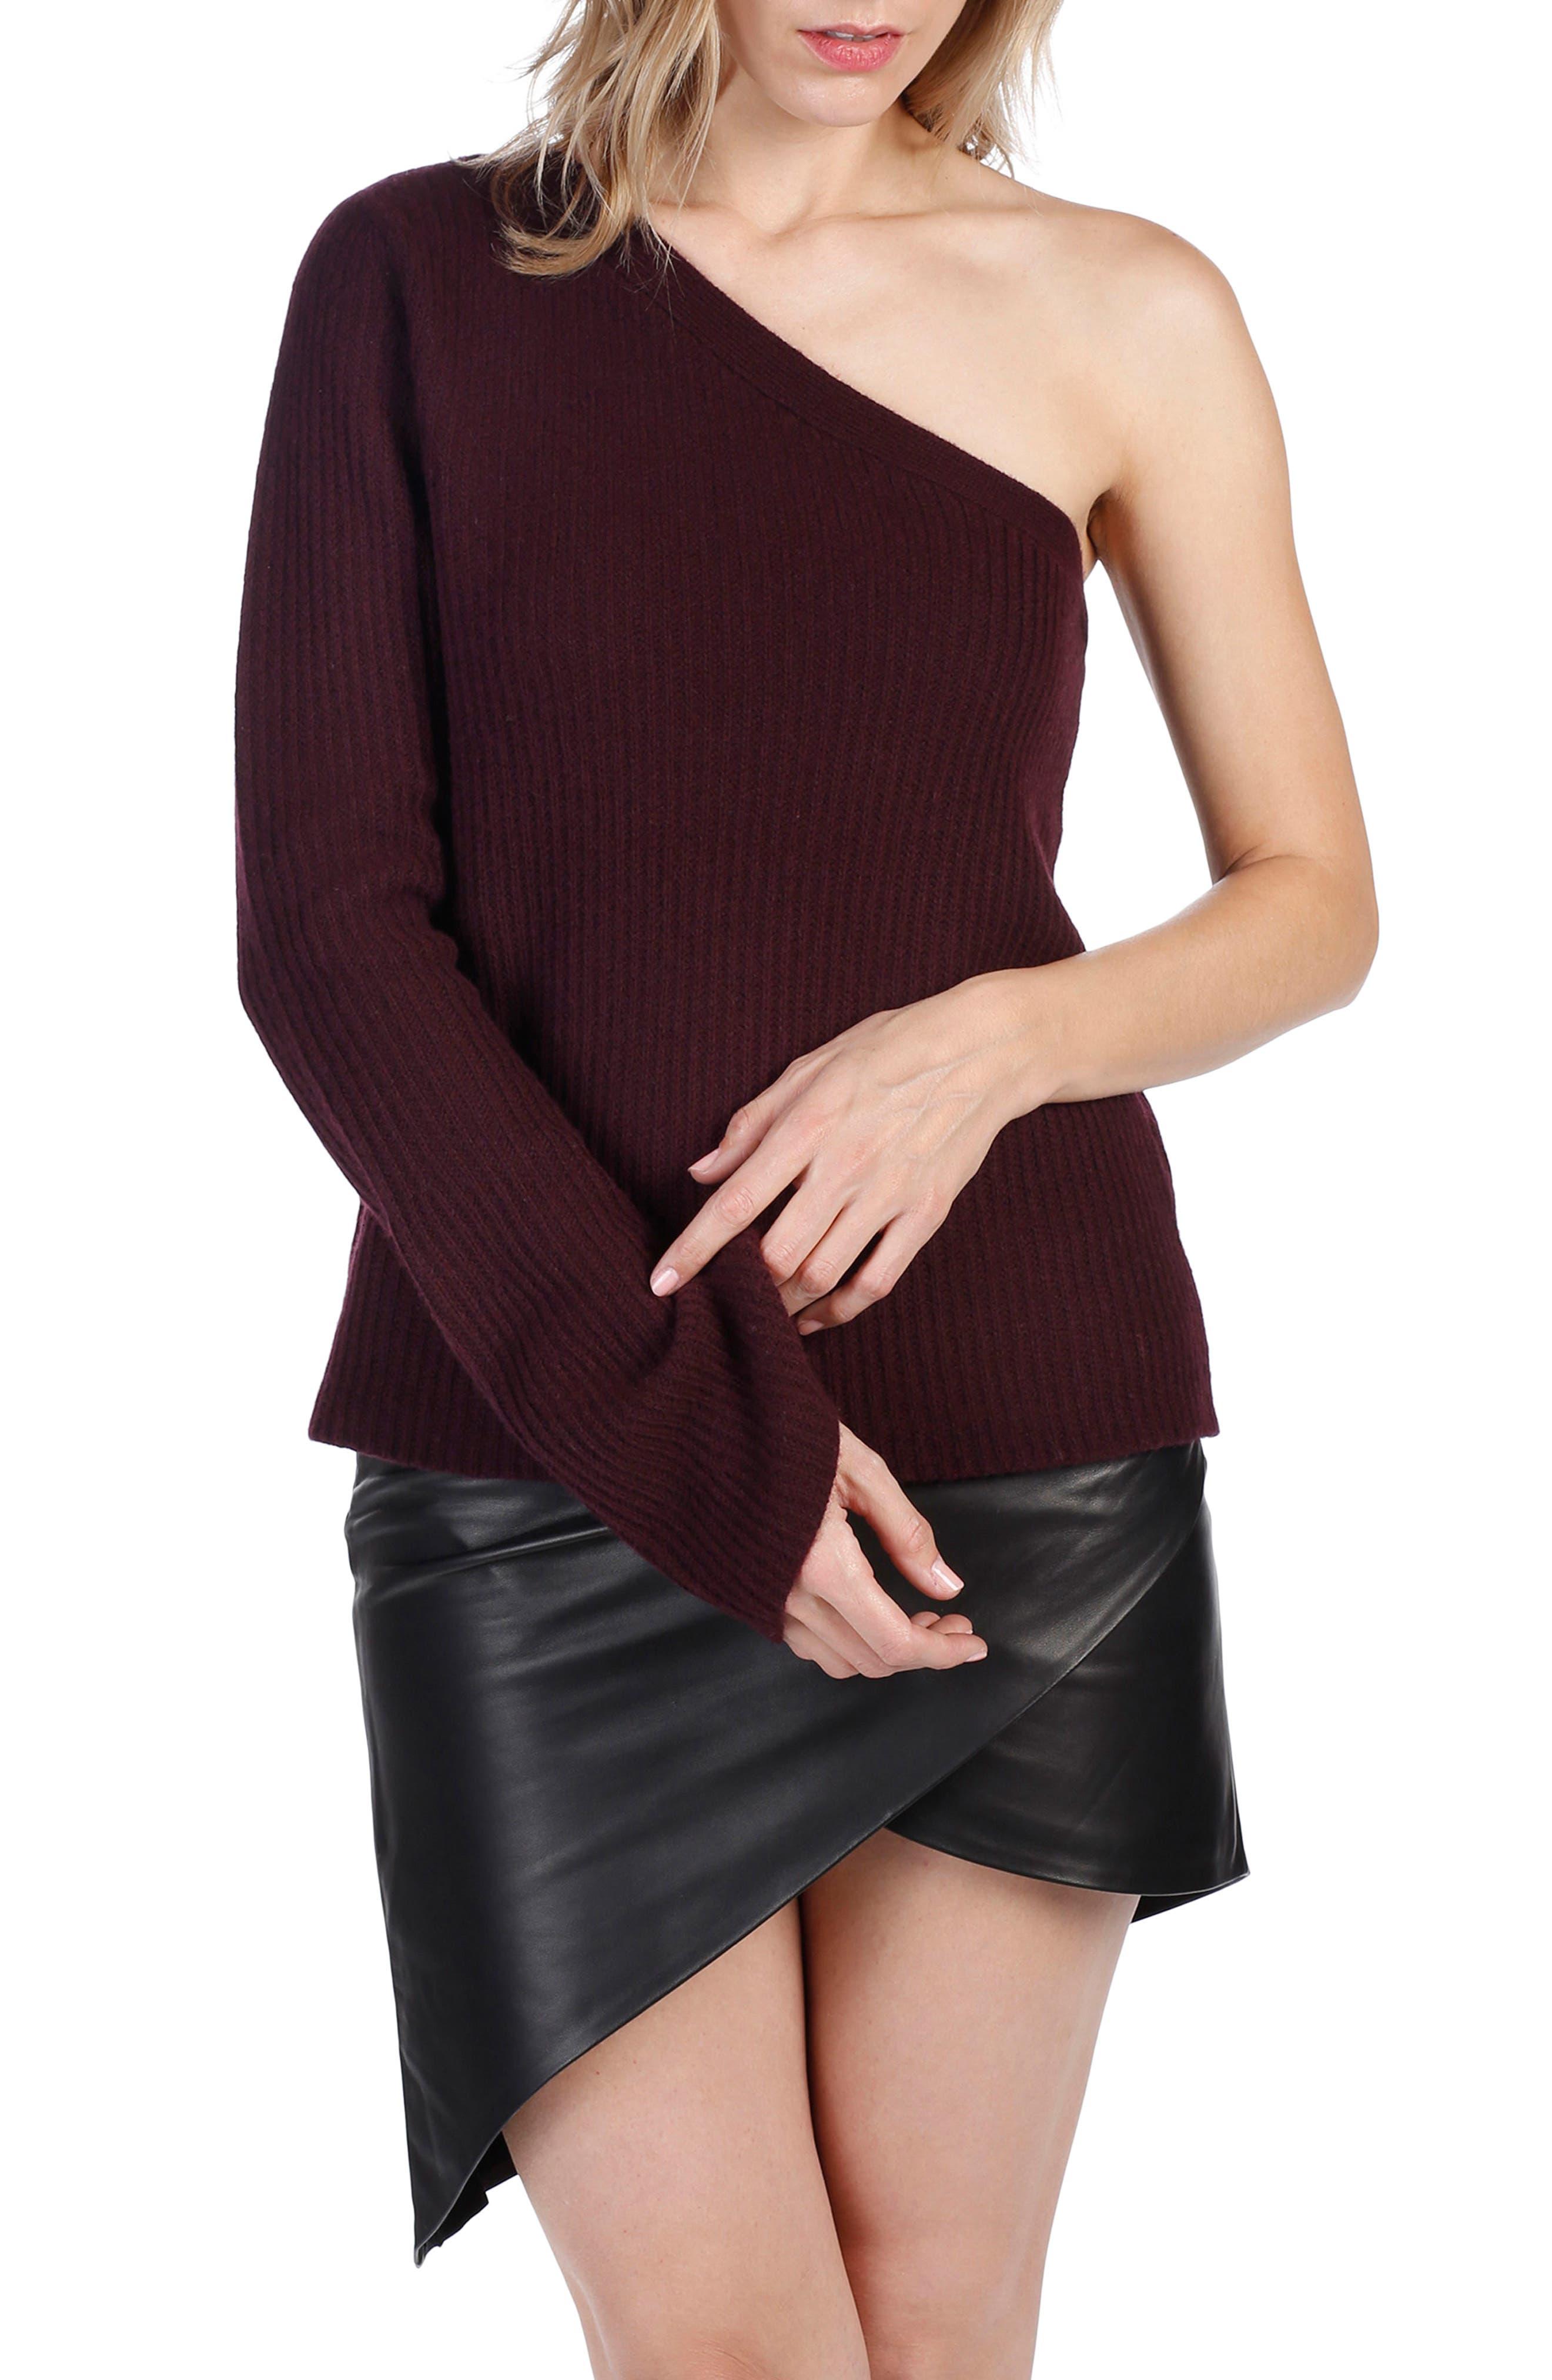 Rosie HW x PAIGE Hadlee One-Shoulder Sweater